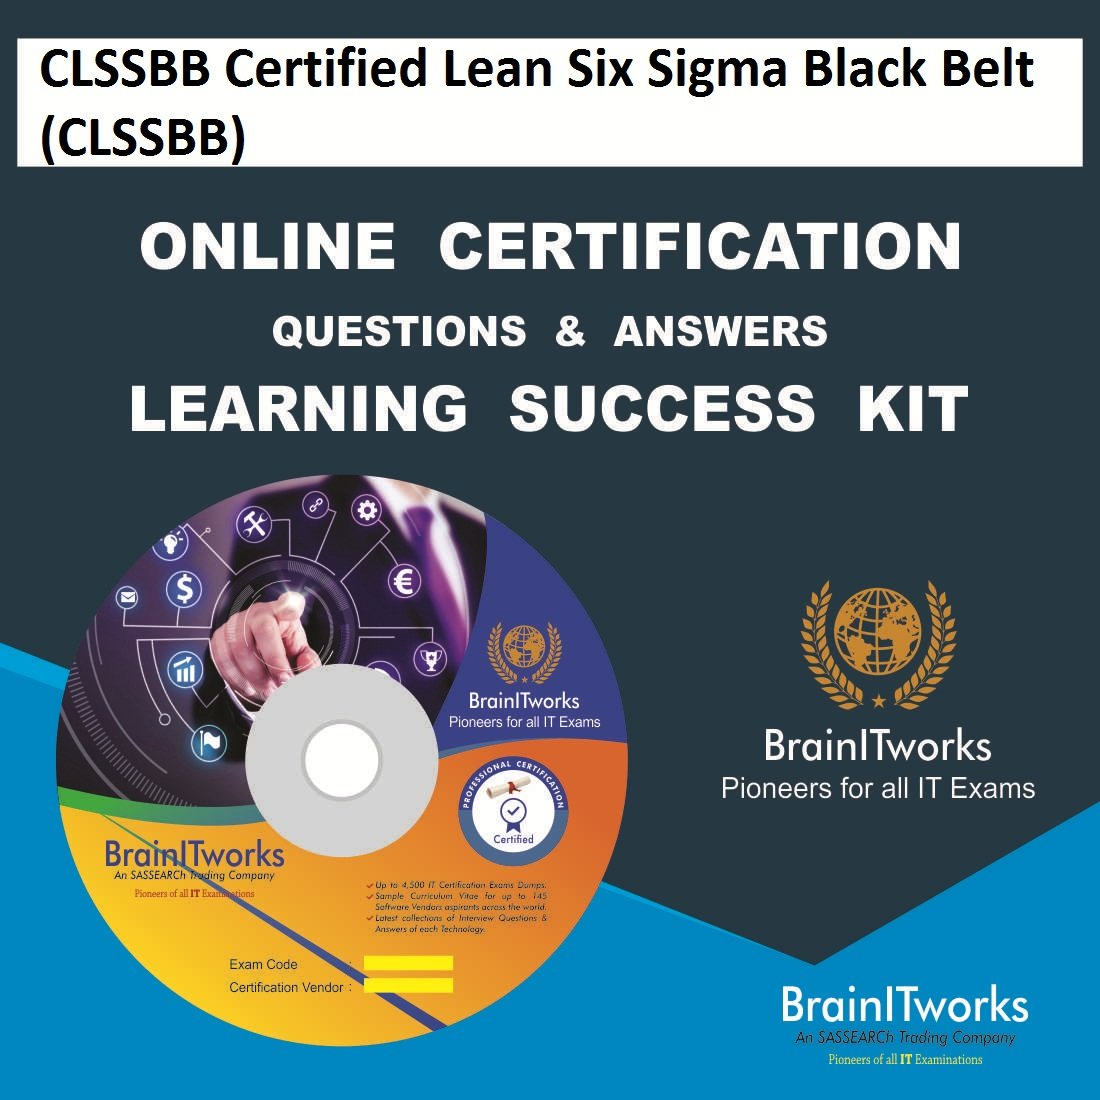 Clssbb Certified Lean Six Sigma Black Belt Clssbb Online